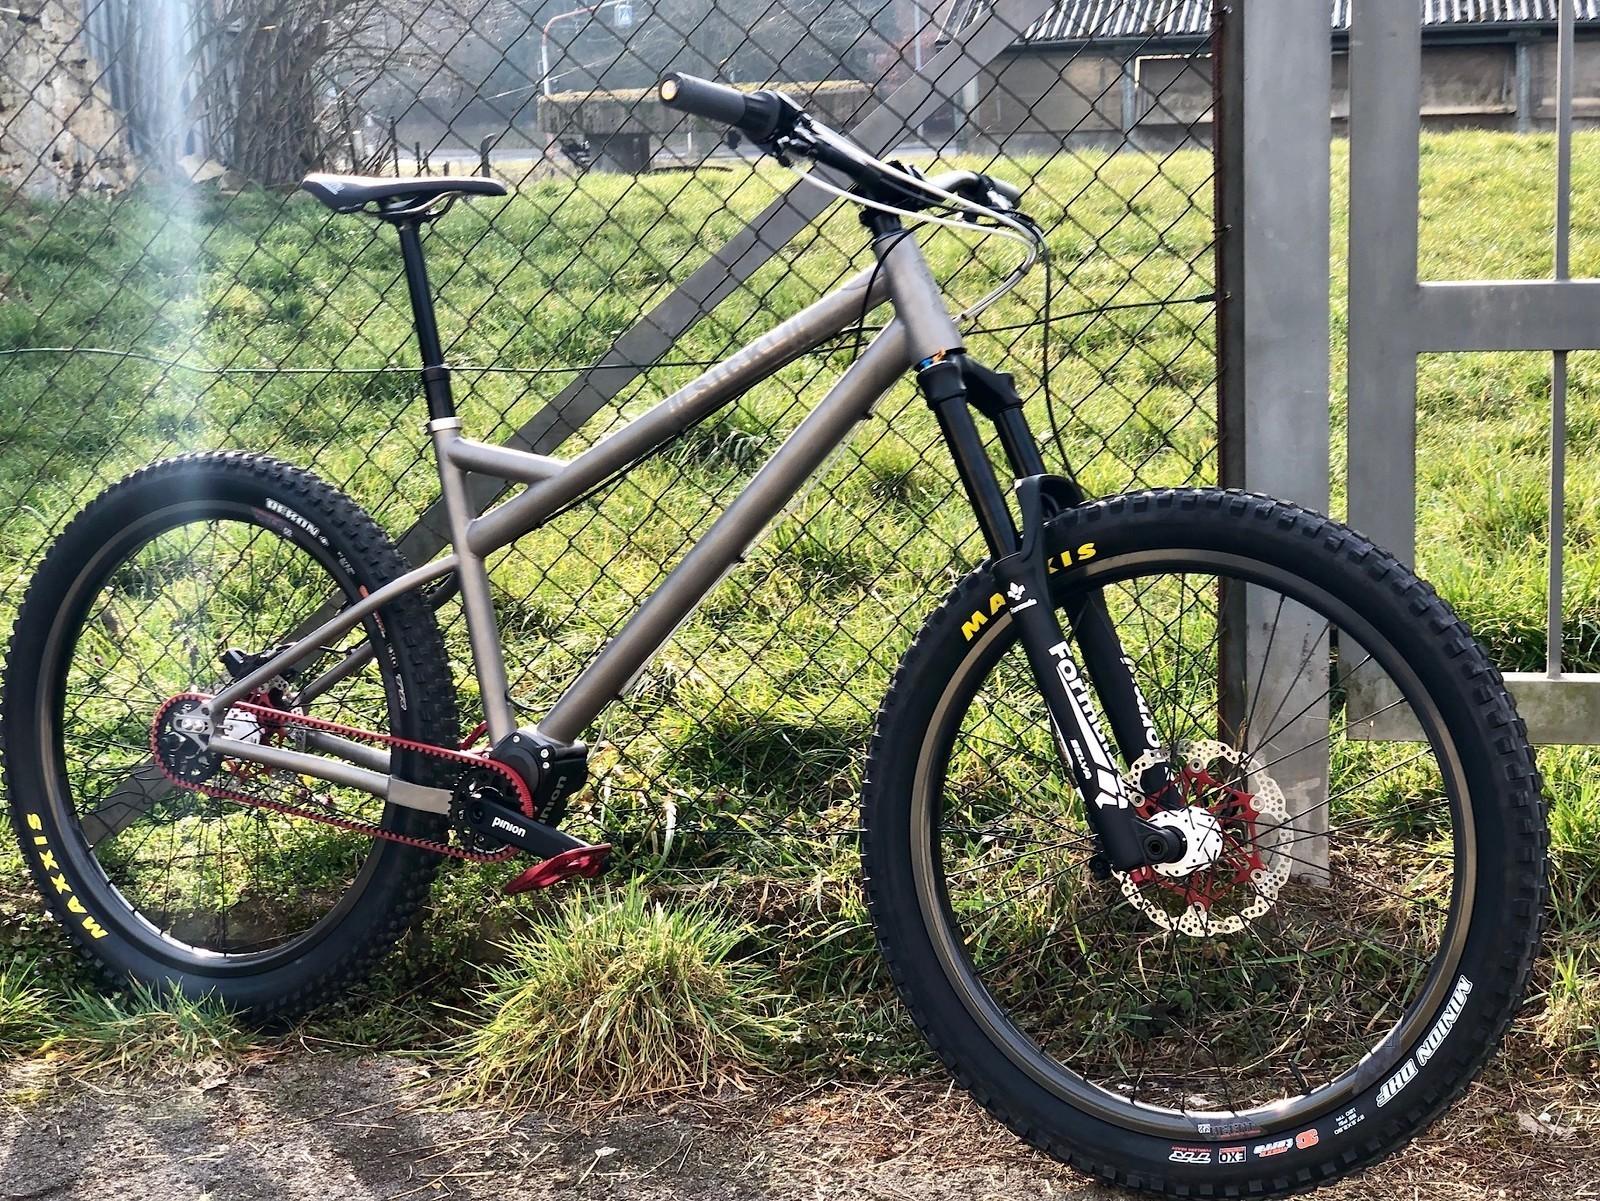 Sick Bicycles Wulfbaron - 2019 Vital Bike of the Day Collection - Mountain Biking Pictures - Vital MTB